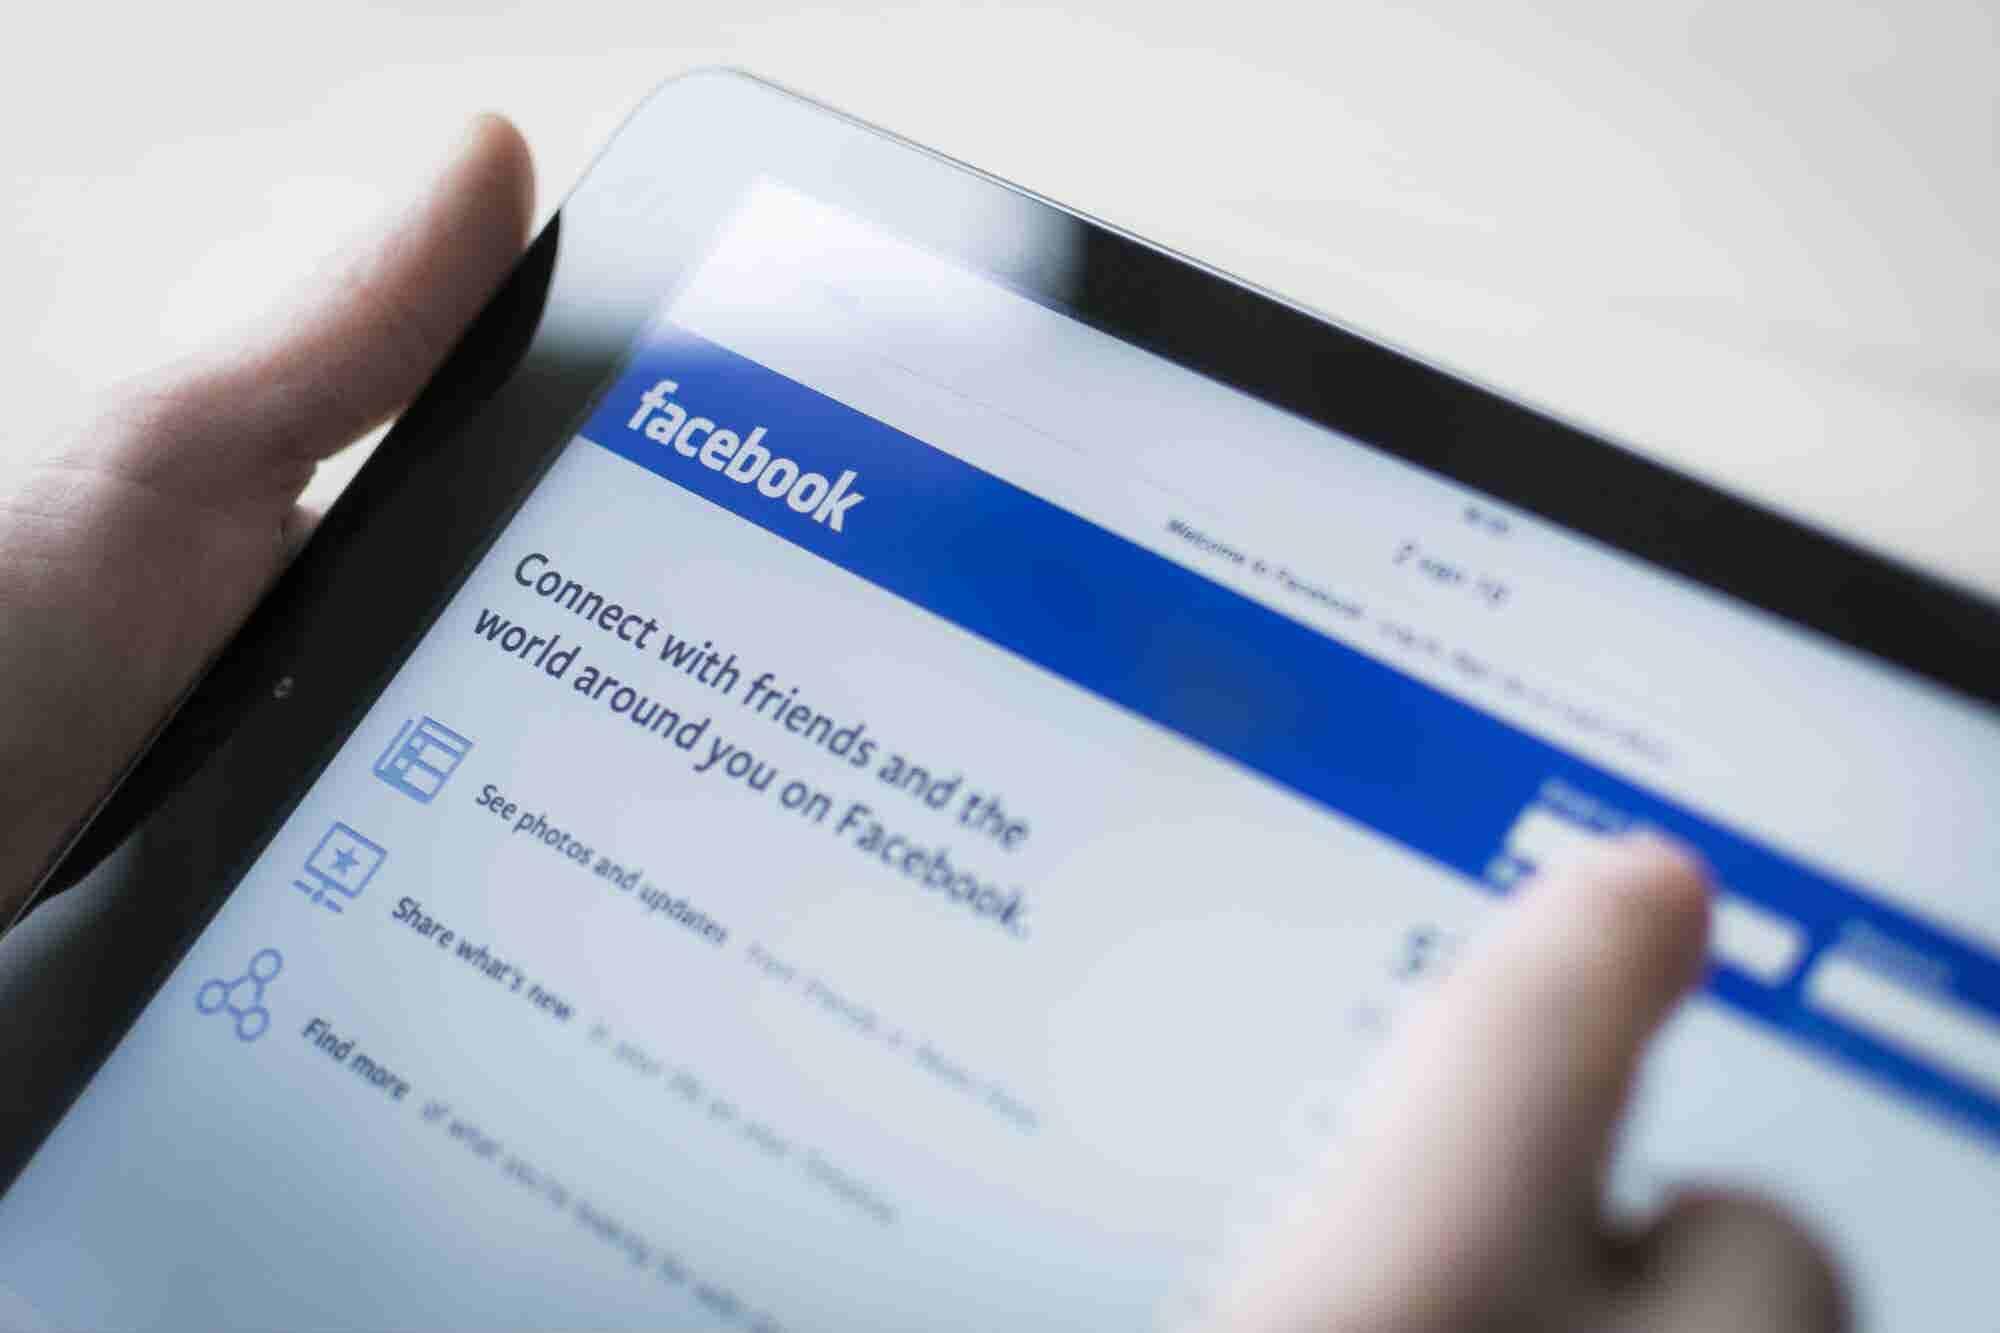 ¿Vender a través de Facebook? Pronto podrás recibir pagos por esta red social